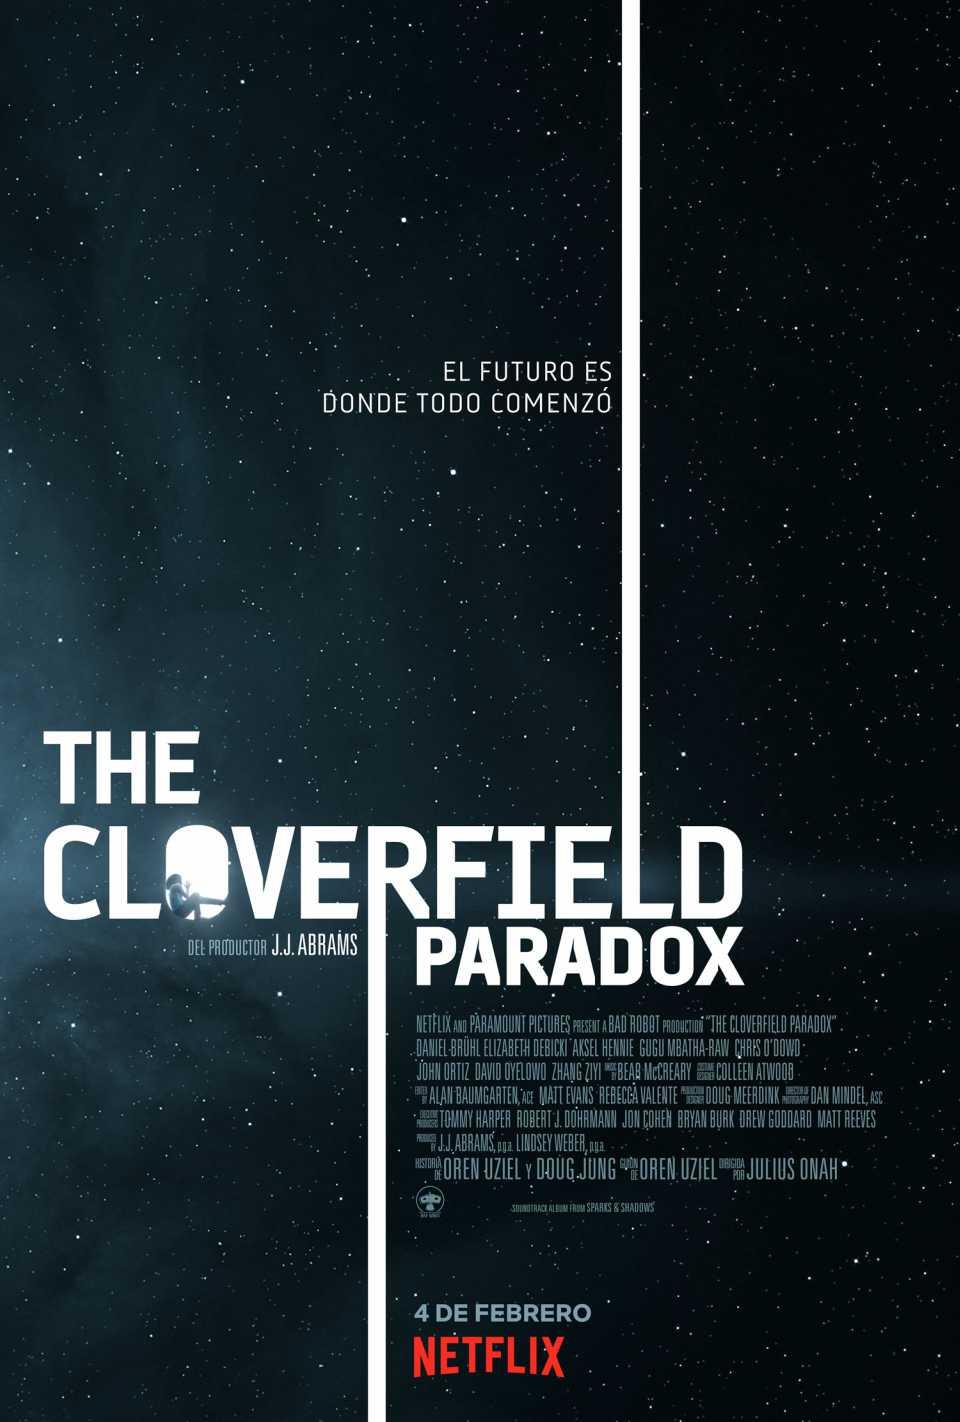 The Cloverfield Paradox ya disponible en Netflix